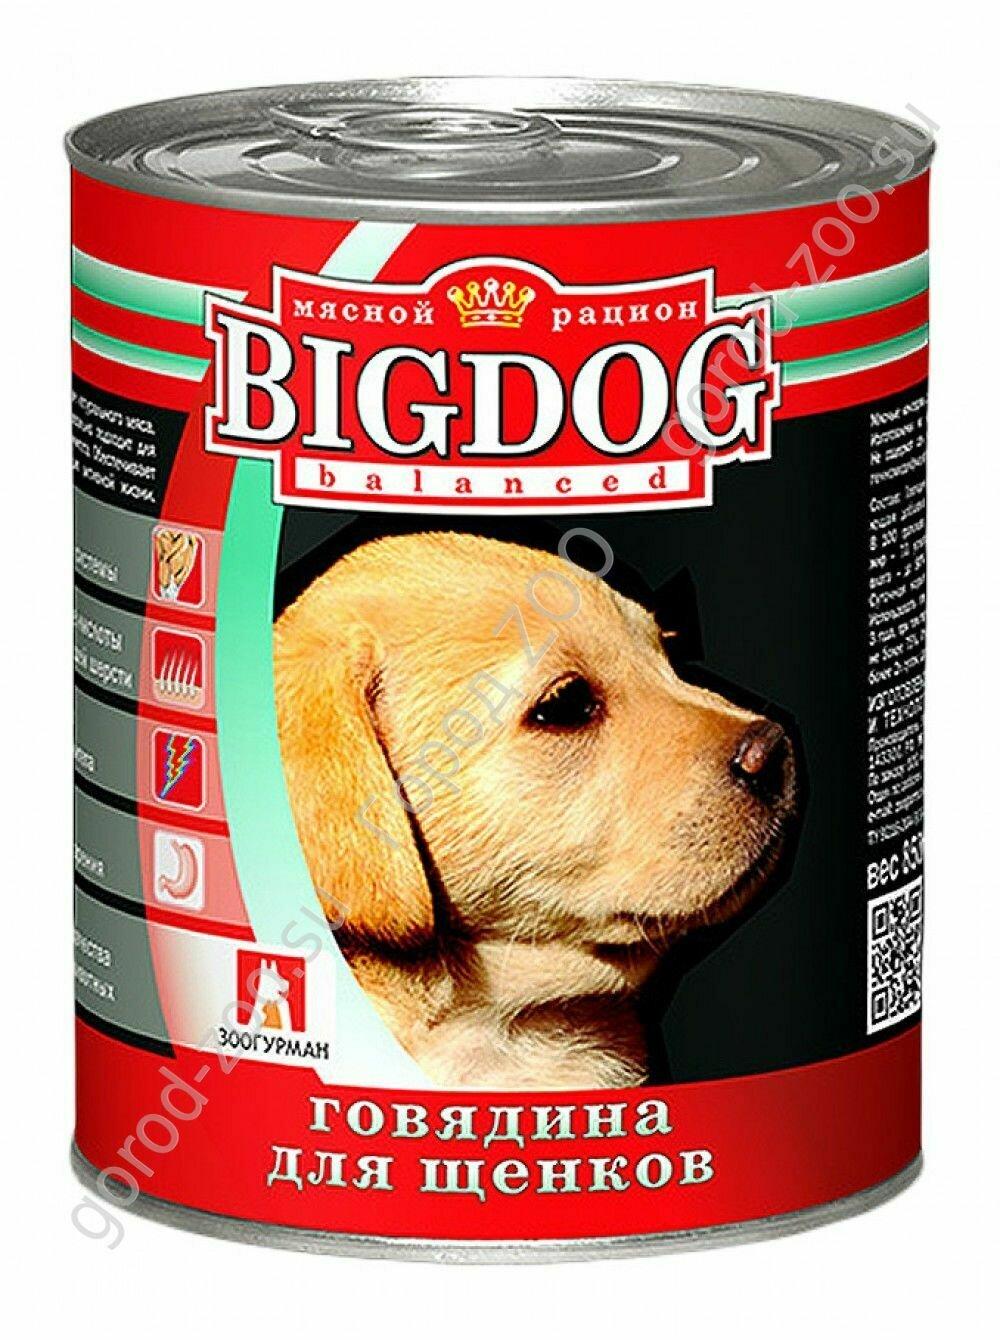 Биг дог Зоогурман BIG DOG конс. д/щен. 850гр Говядина